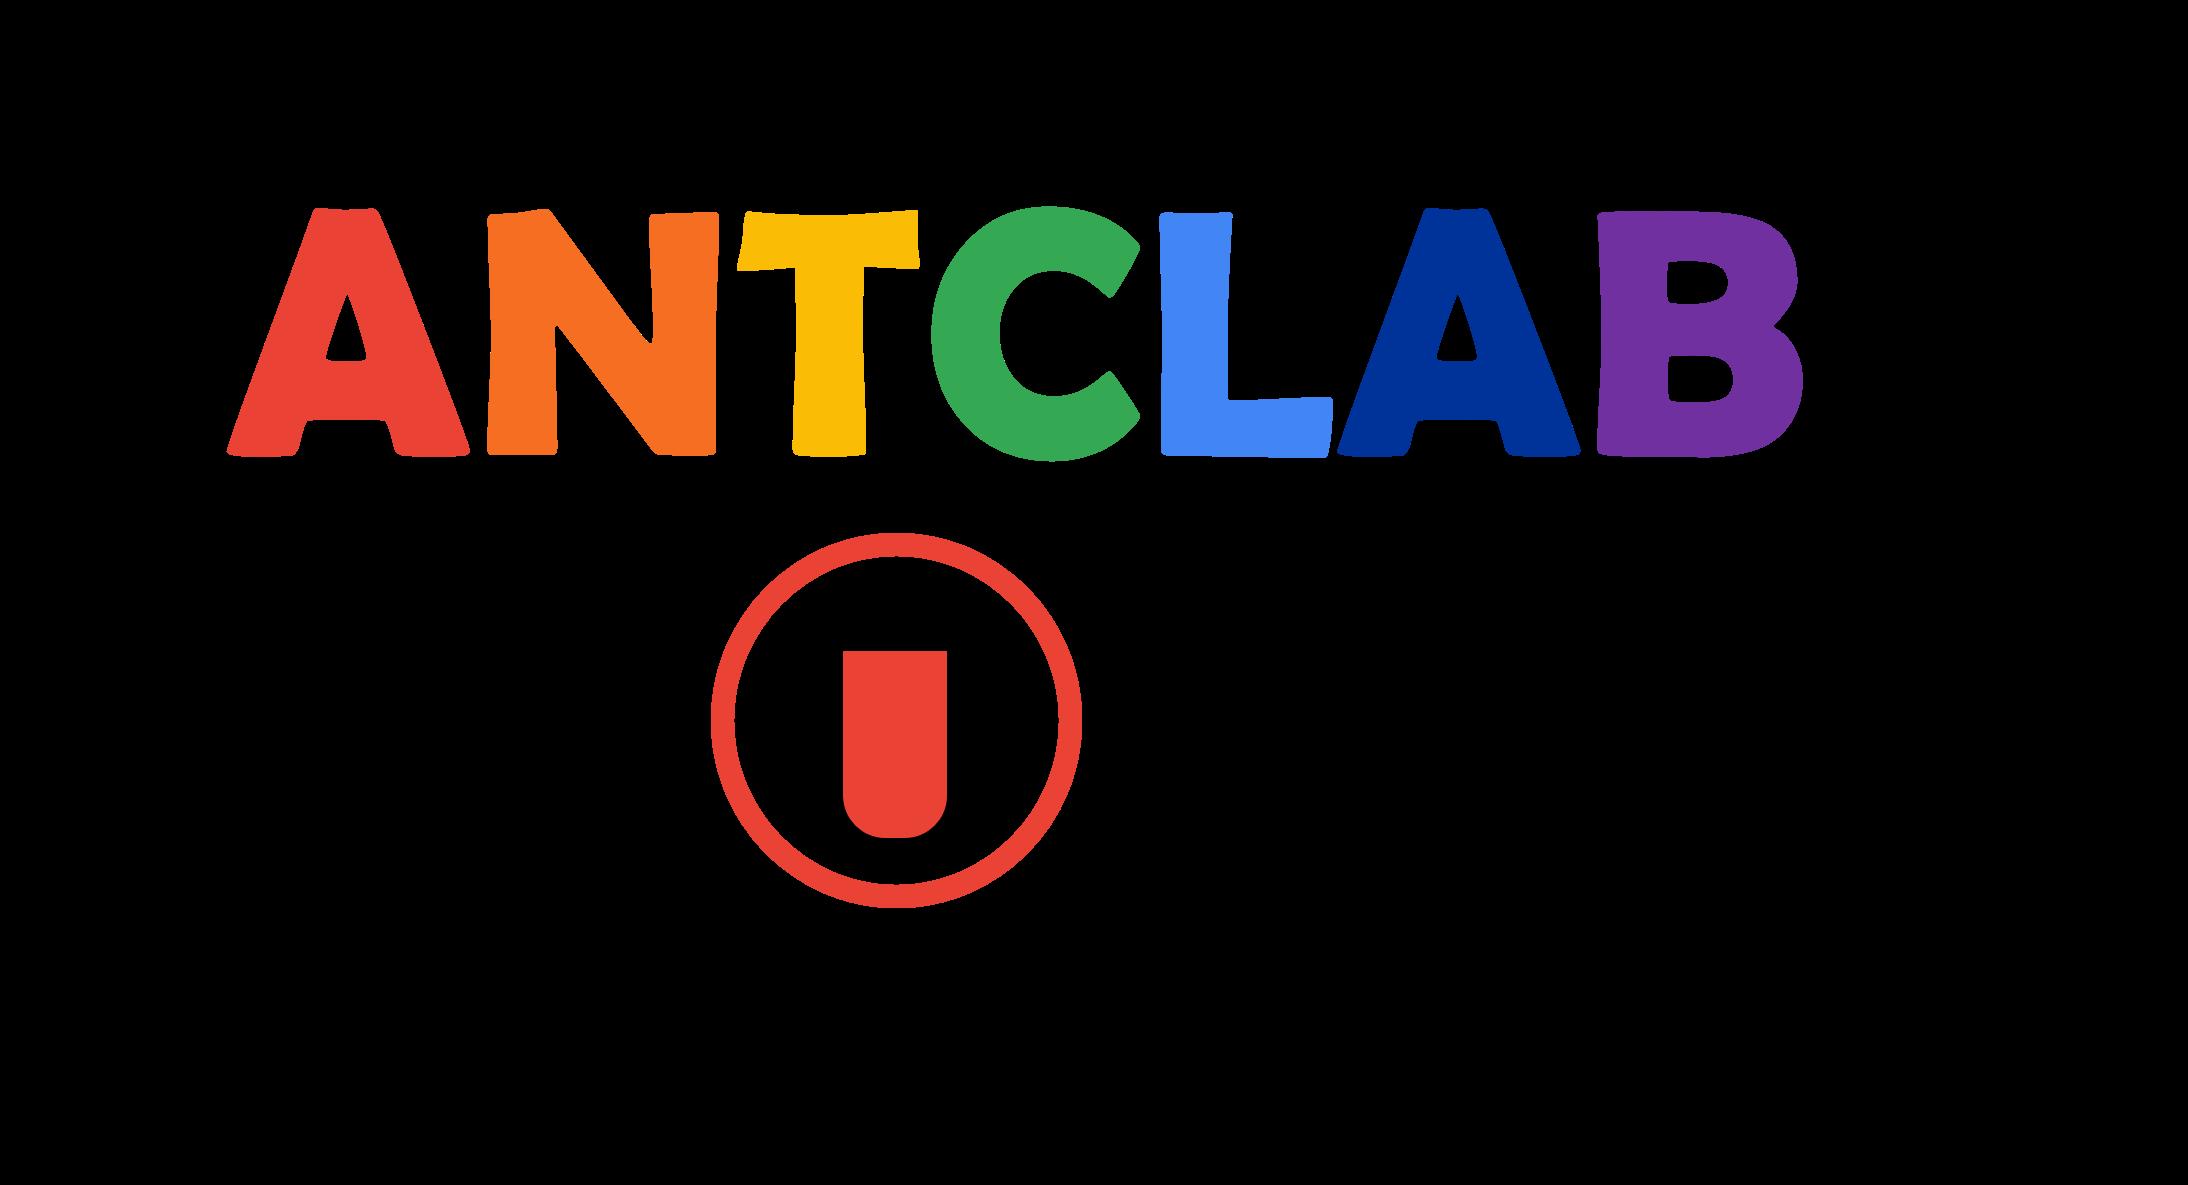 www.antclabs.com